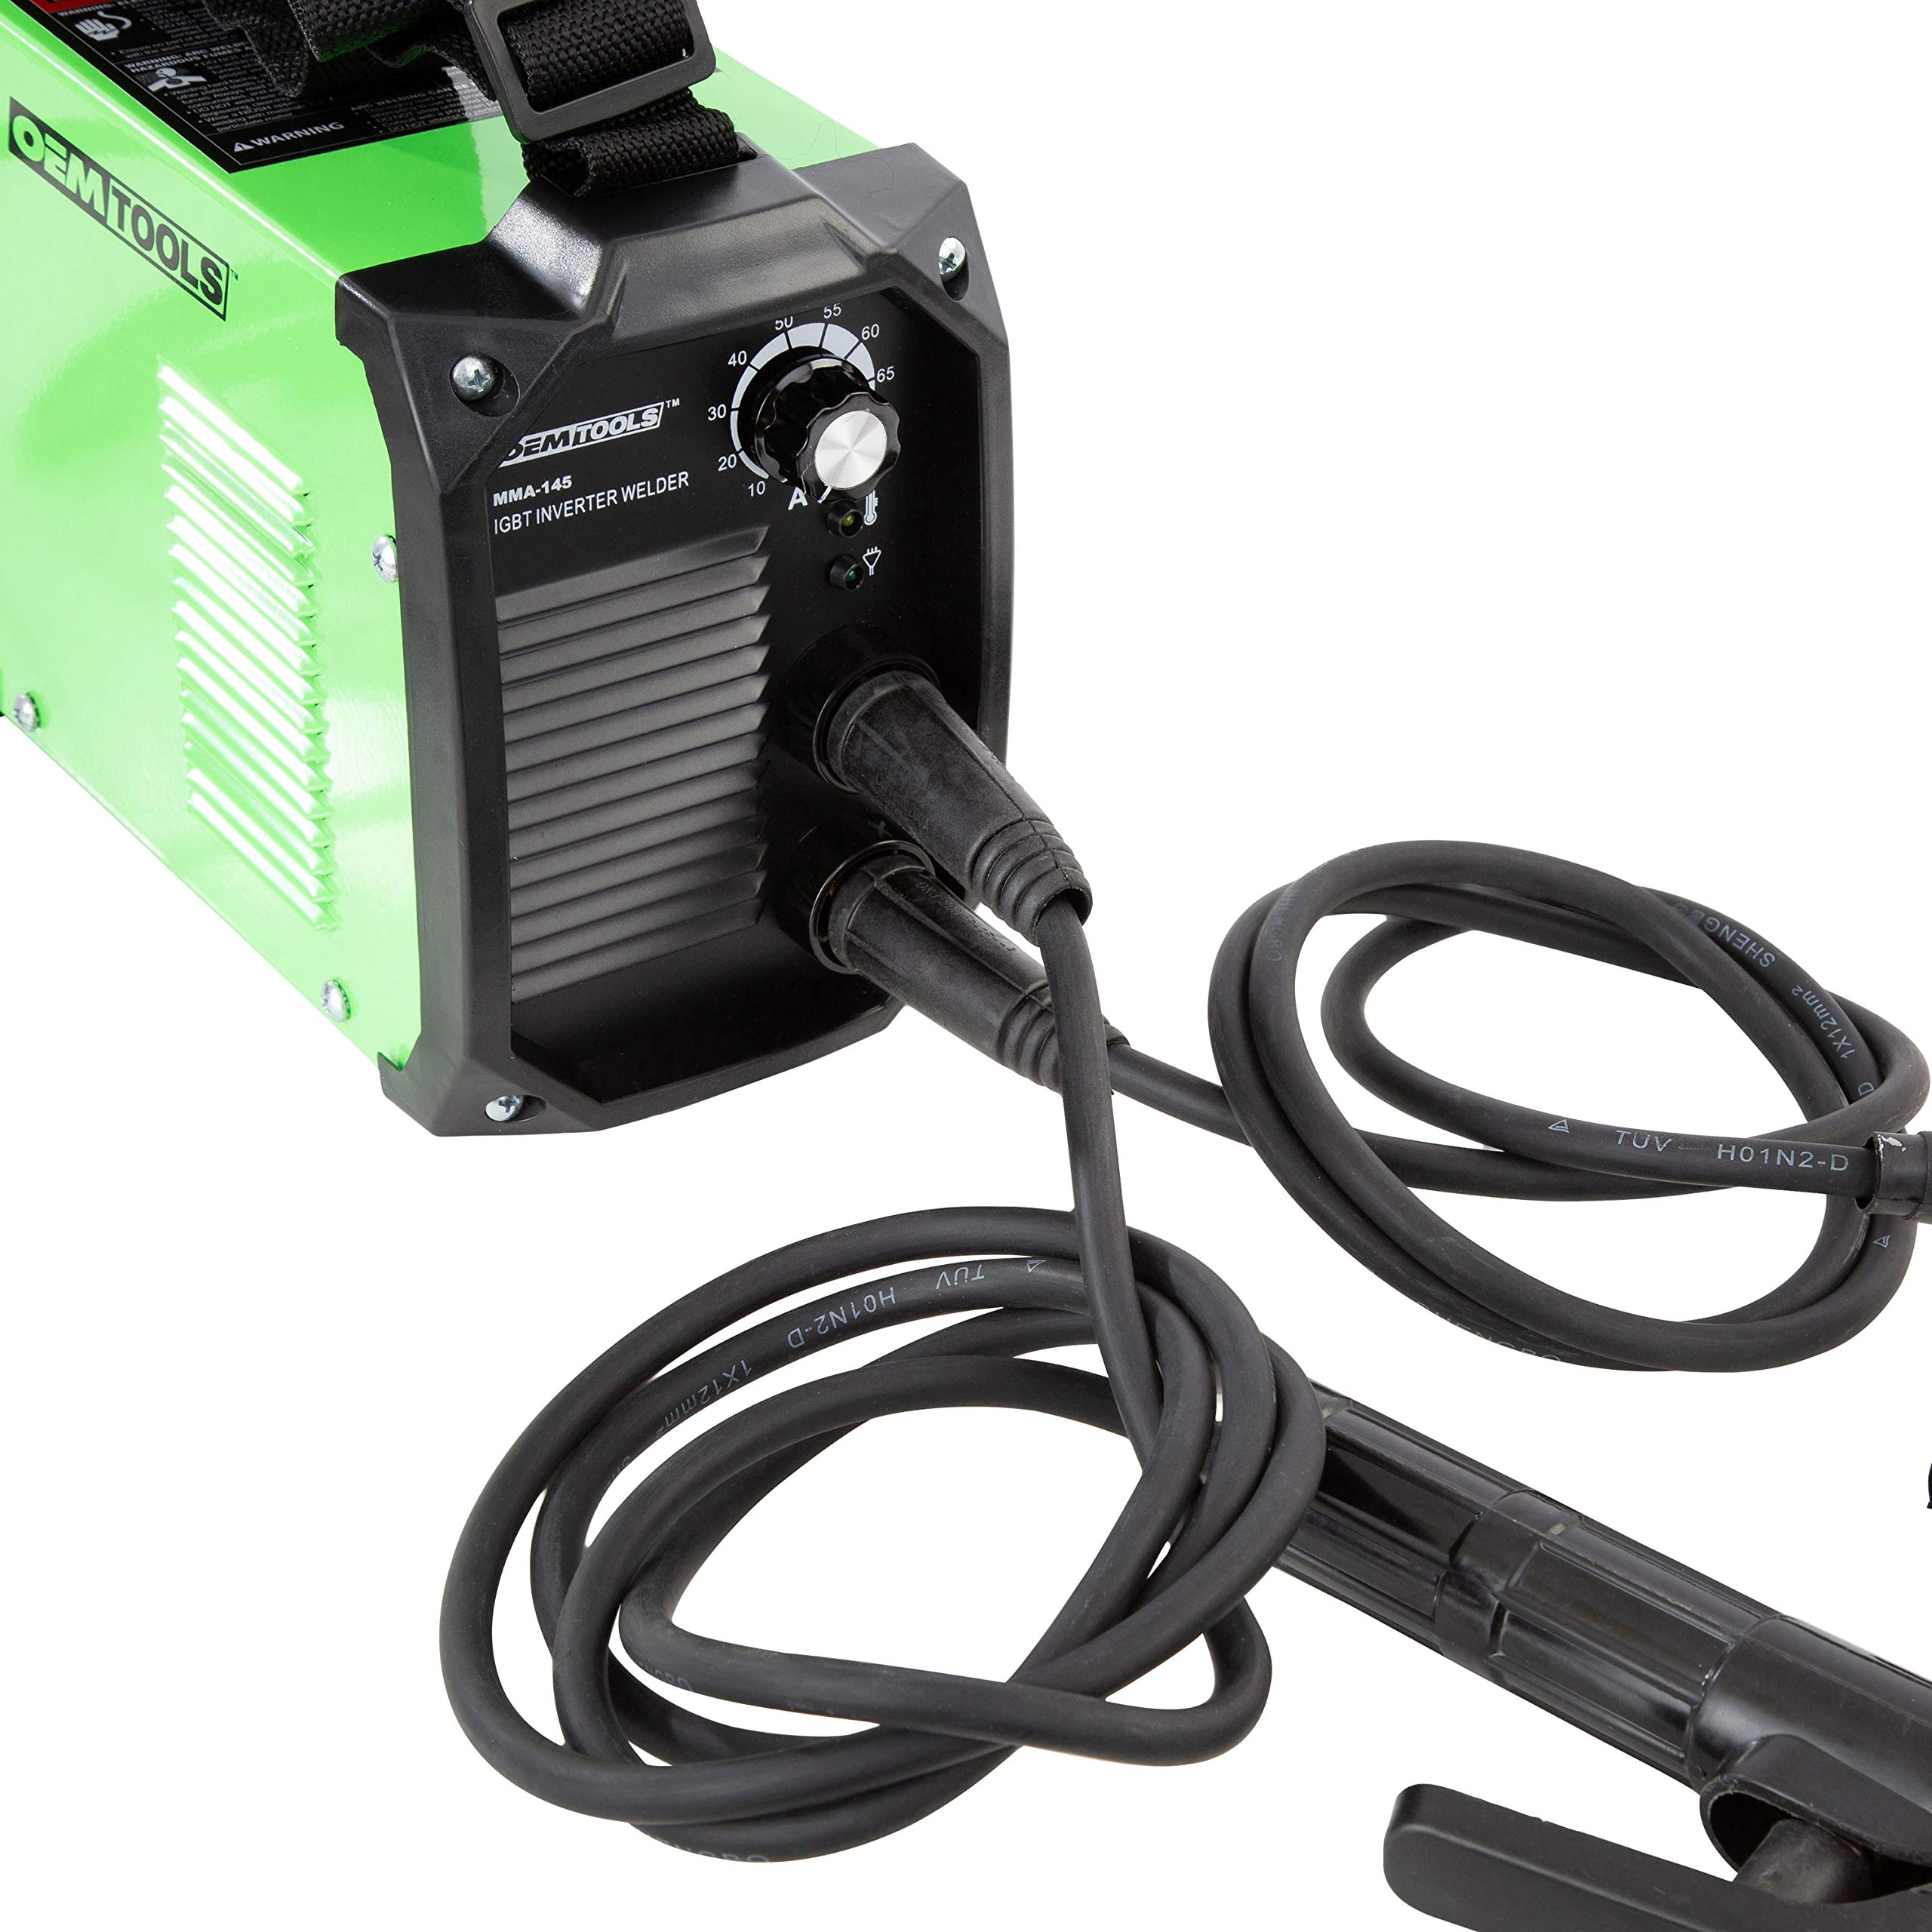 OEMTOOLS 24818 Compact Inverter Stick Welder 110V 70 Amp by OEMTOOLS (Image #4)